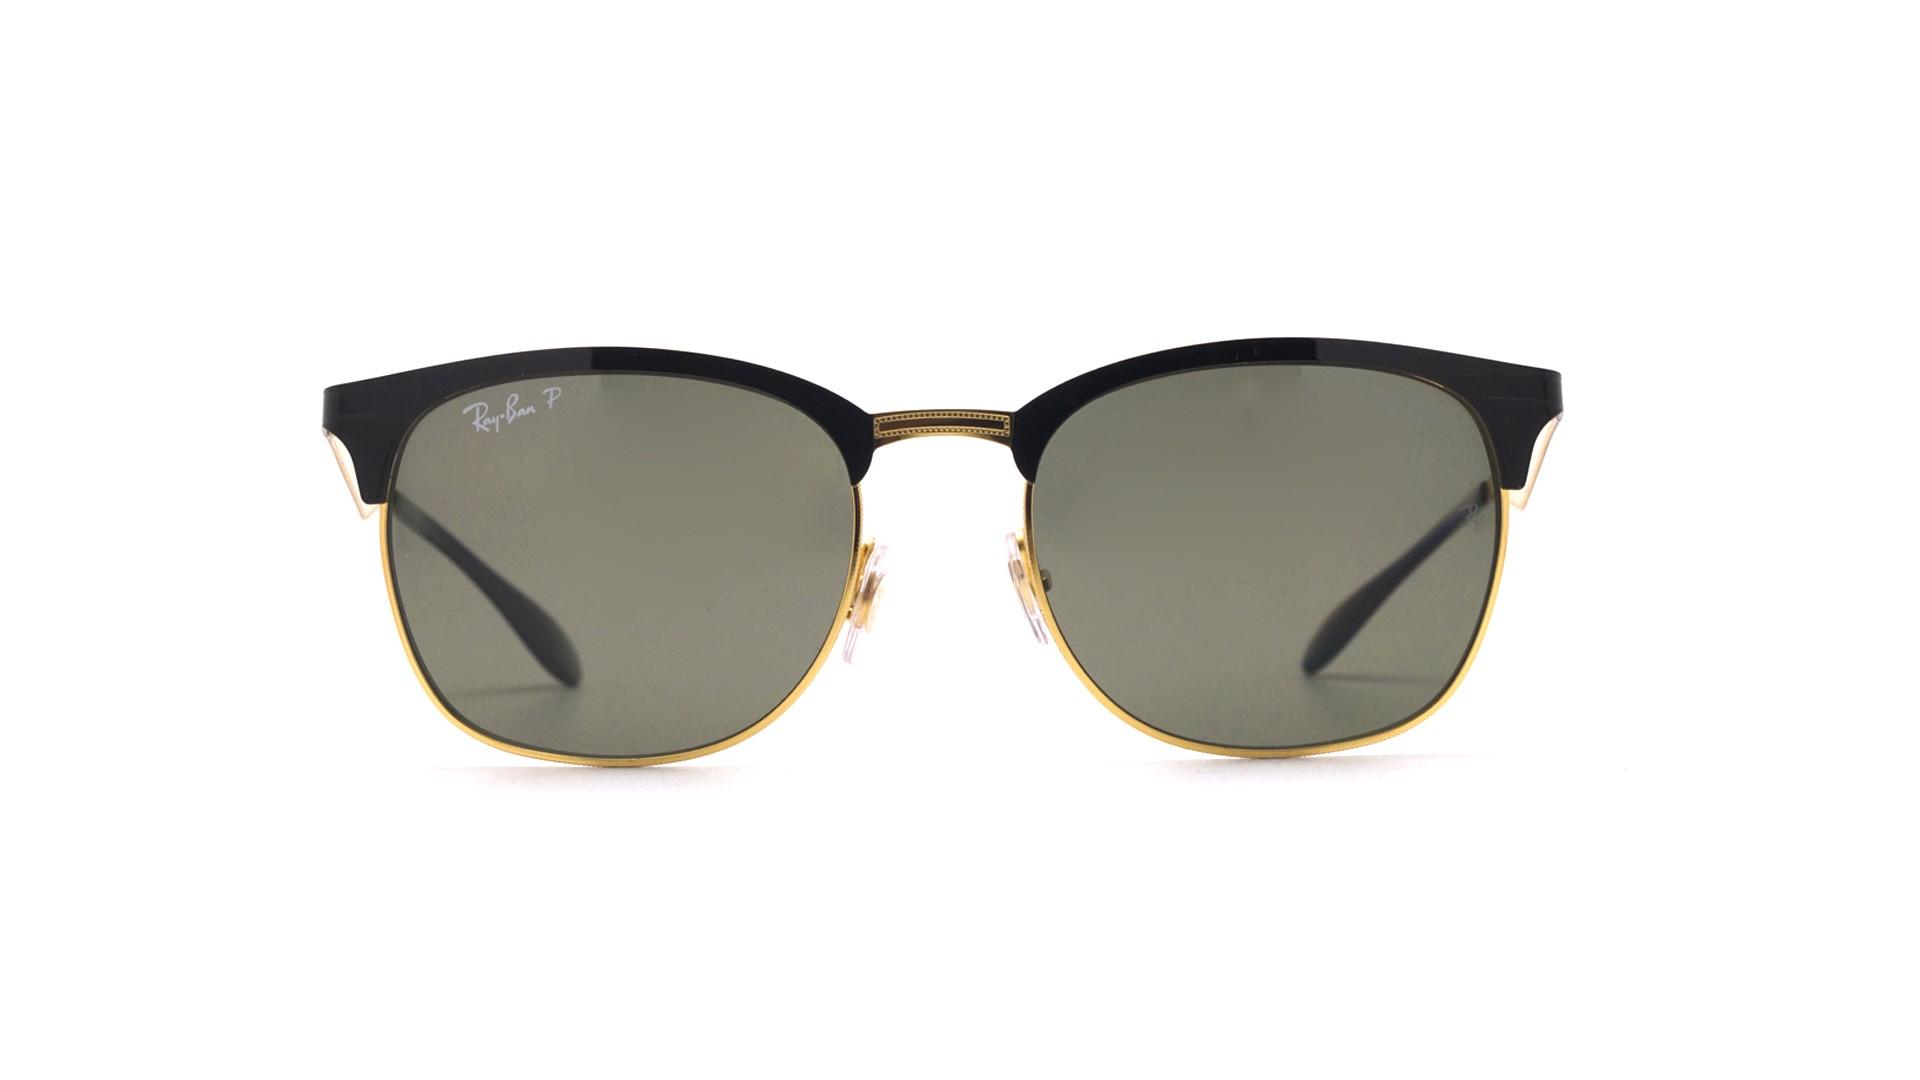 ba3e409096 Sunglasses Ray-Ban RB3538 187 9A 53-19 Black Medium Polarized